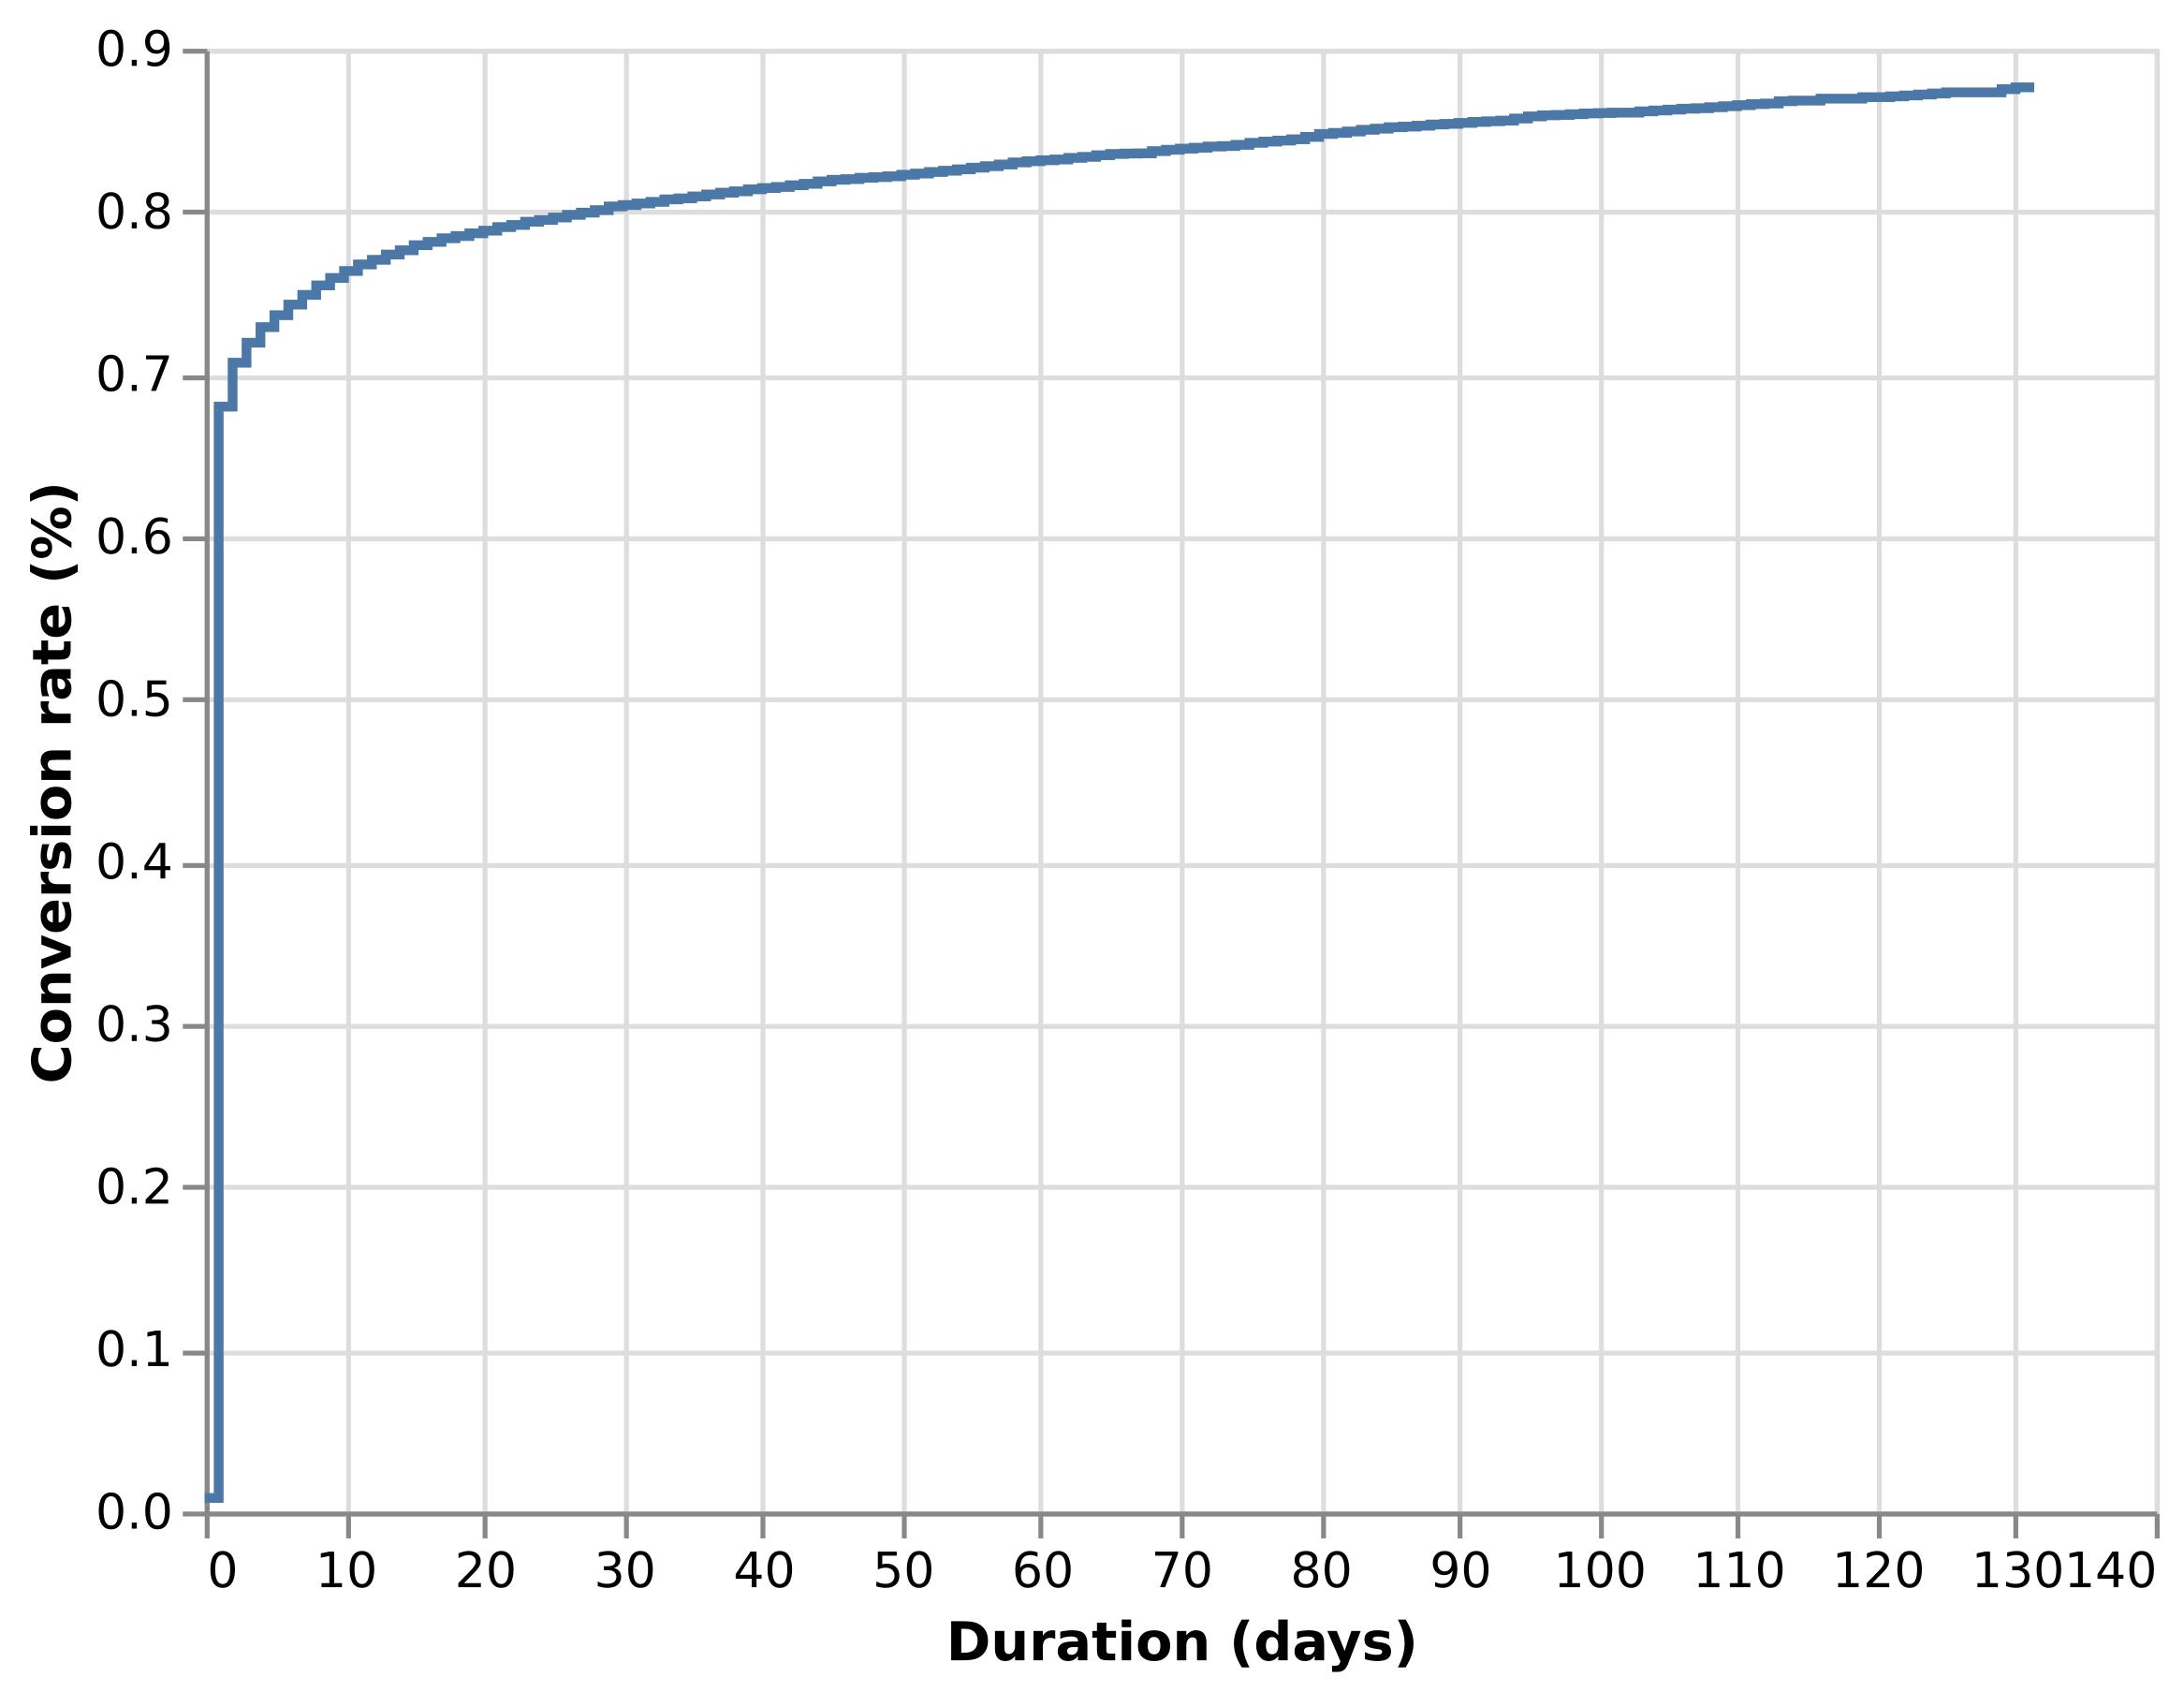 Conversion rate curve estimate for Retail Rocket data